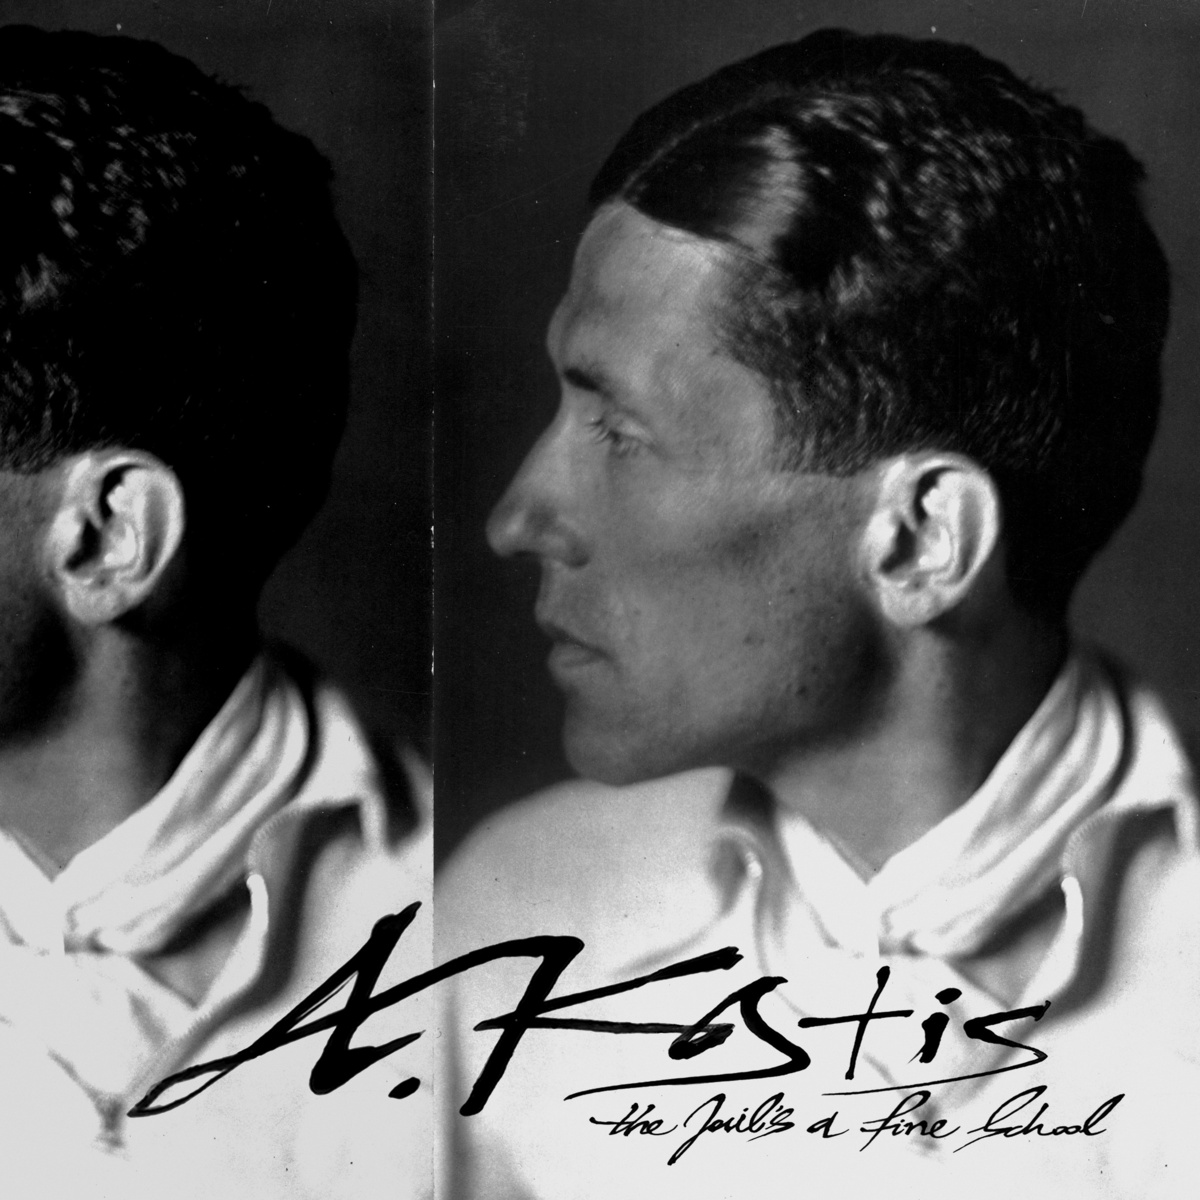 A. Kostis -The Jail's a Fine School  Release Date: September 18, 2015 Label: Olvido/Mississippi Records  SERVICE: Restoration, Mastering SOURCE MATERIAL: 78 rpm records NUMBER OF DISCS: 1 GENRE: Greek Rebetika FORMAT: LP,Digital